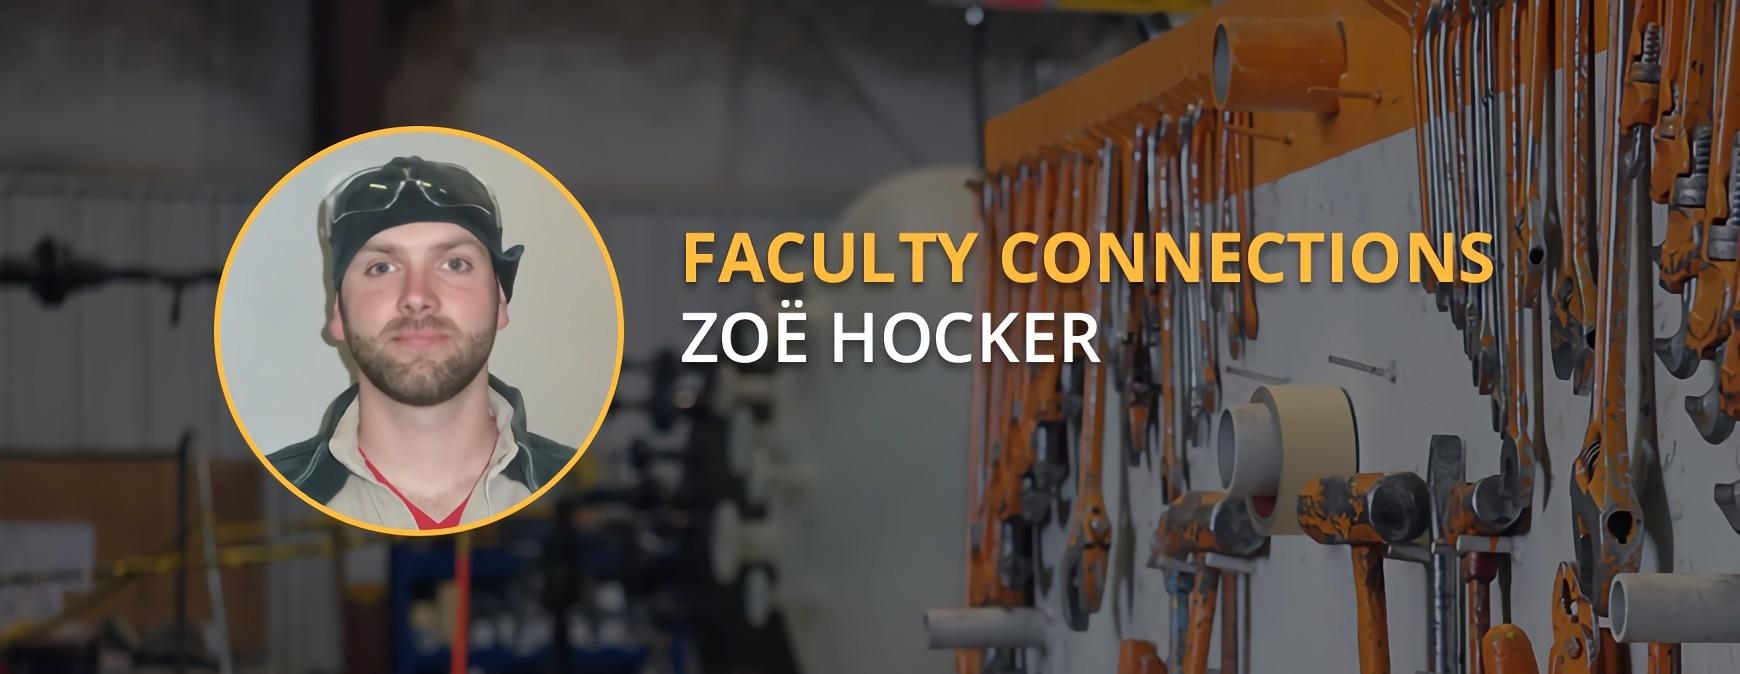 Zoe Hocker fc